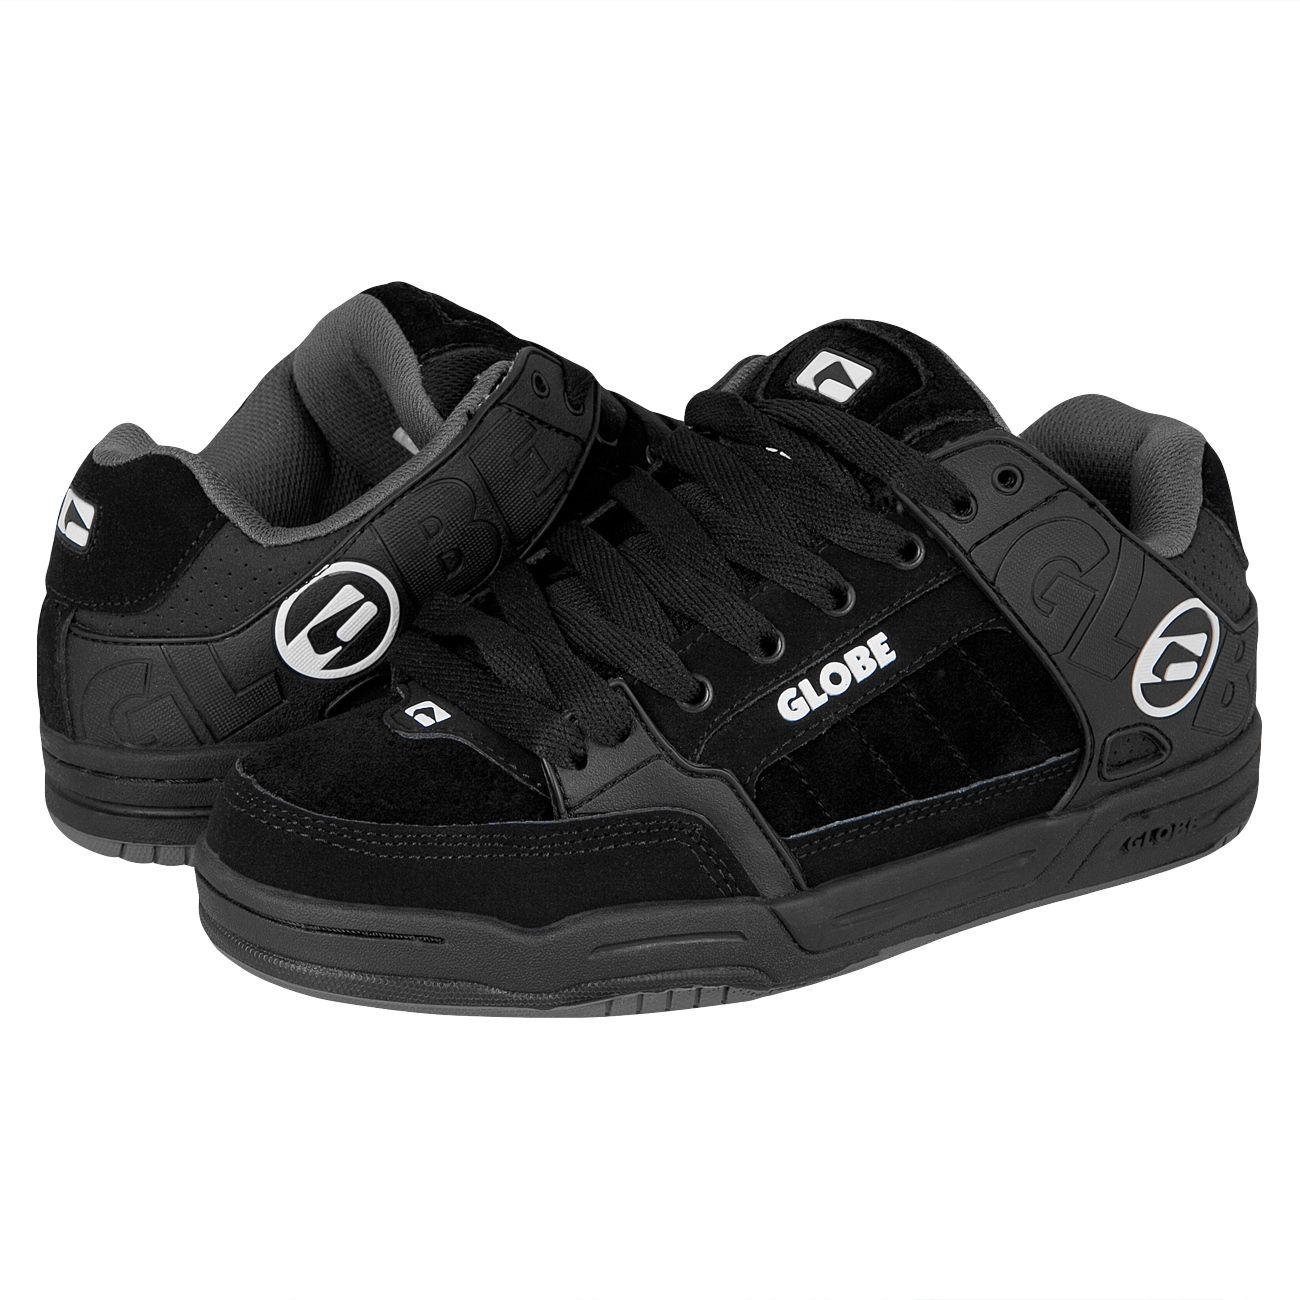 494d0f90736 Globe Skate Shoes